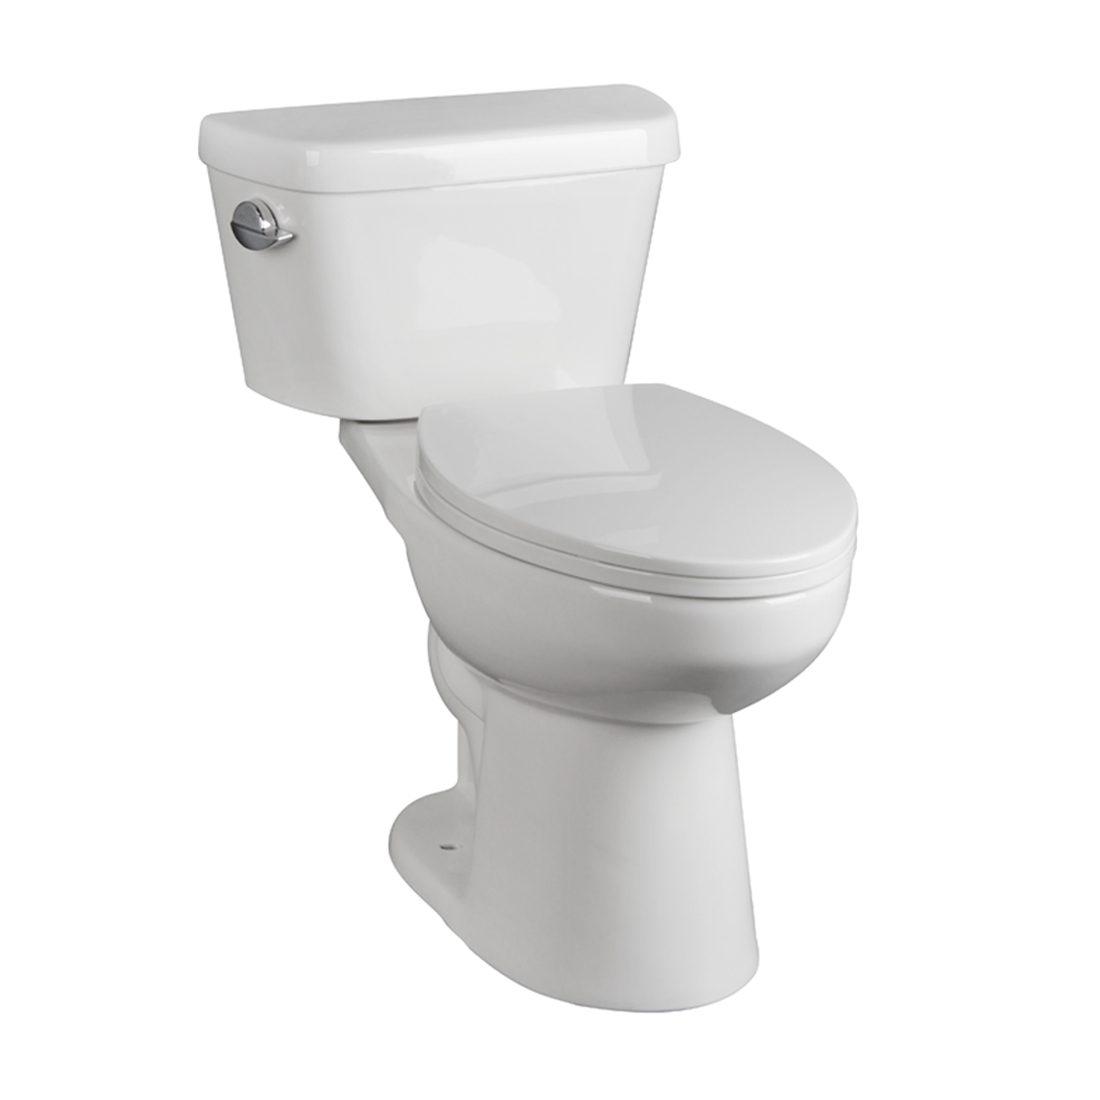 Hobbit Toilet 16.5inch 3.8L White Front View